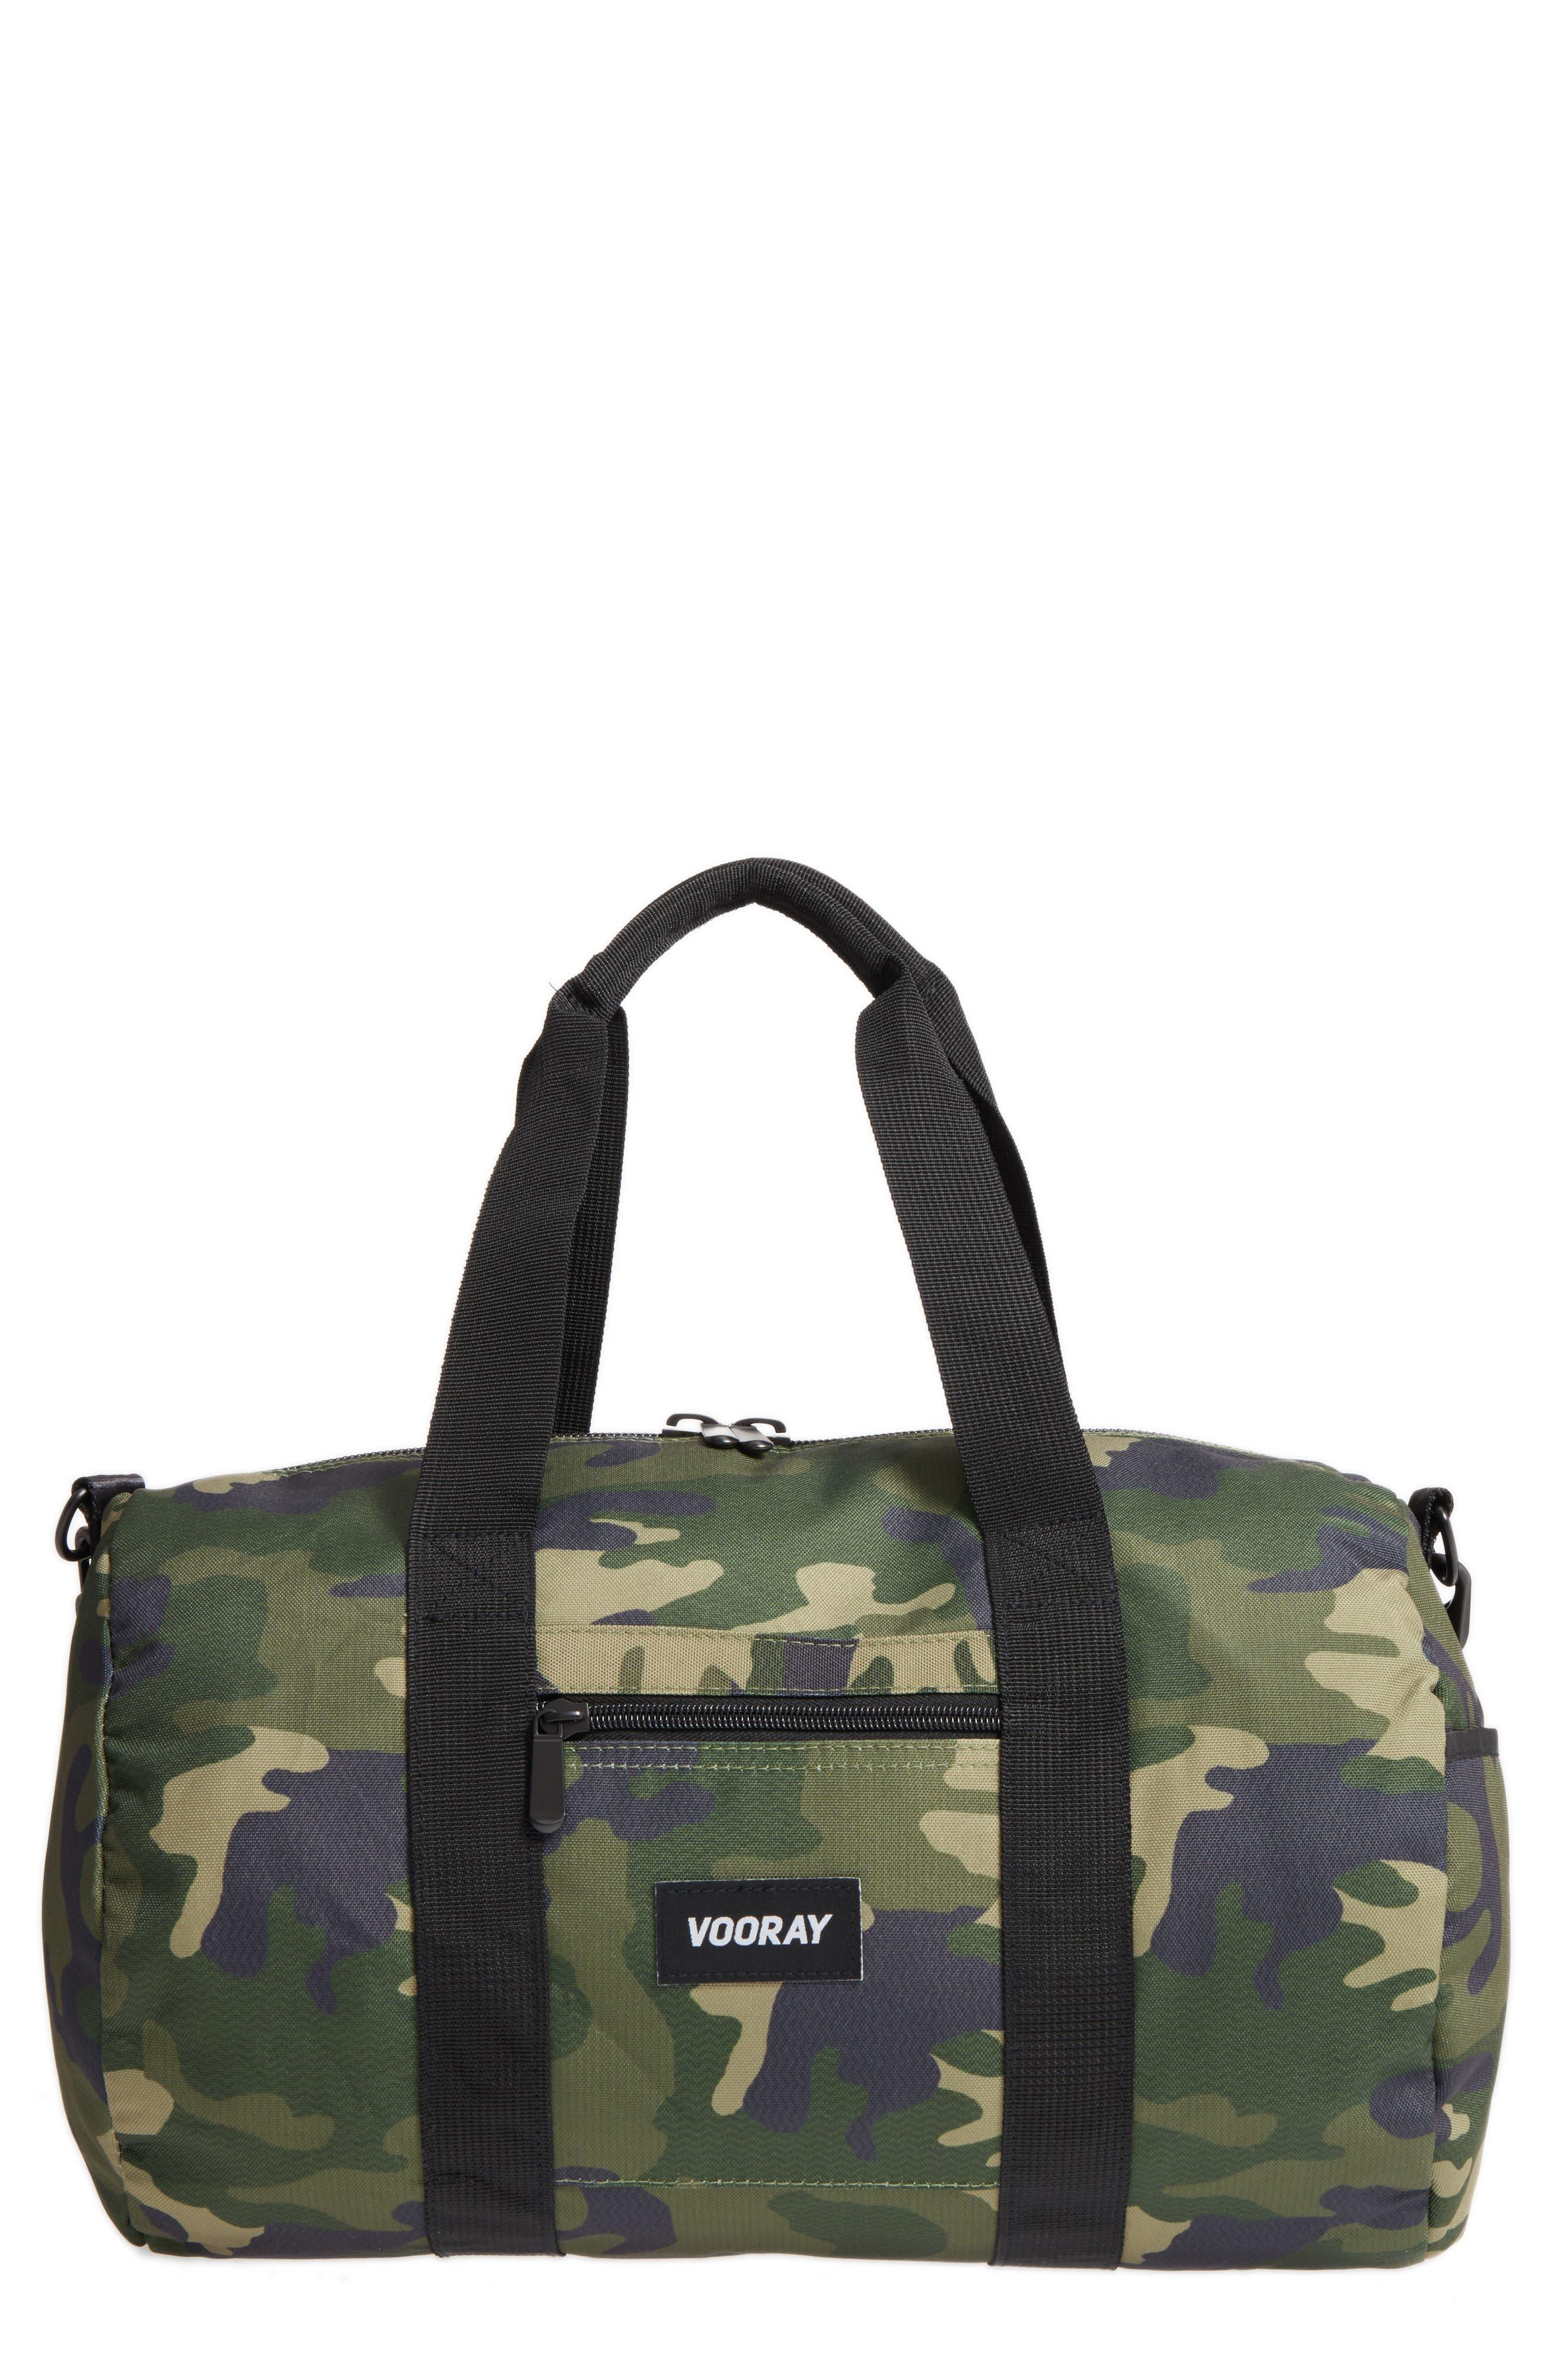 Roadie Small Duffel Bag,                             Main thumbnail 1, color,                             GREEN CAMO